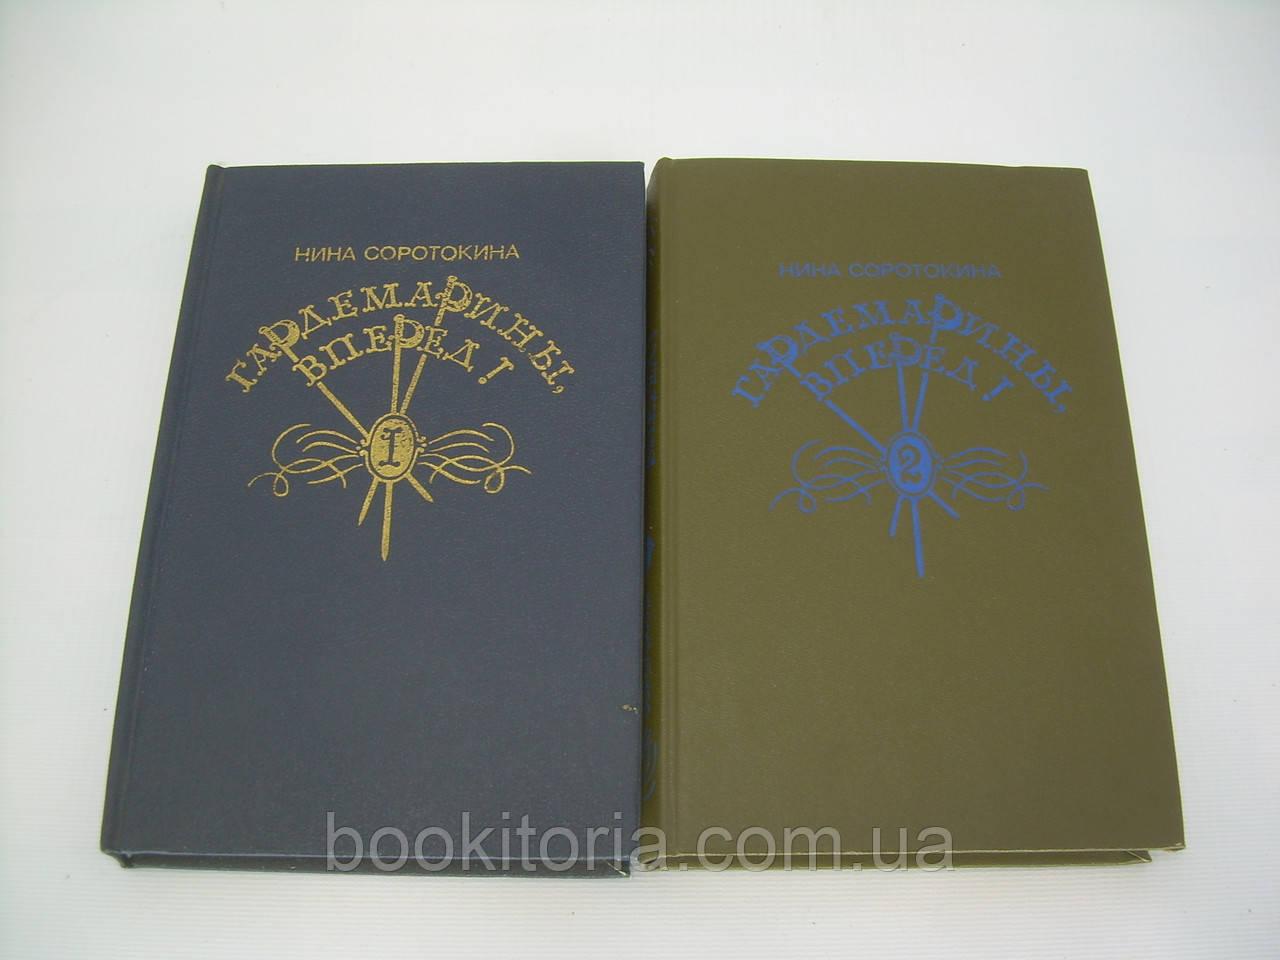 Соротокина Н. Гардемарины, вперед! В двух томах (б/у).